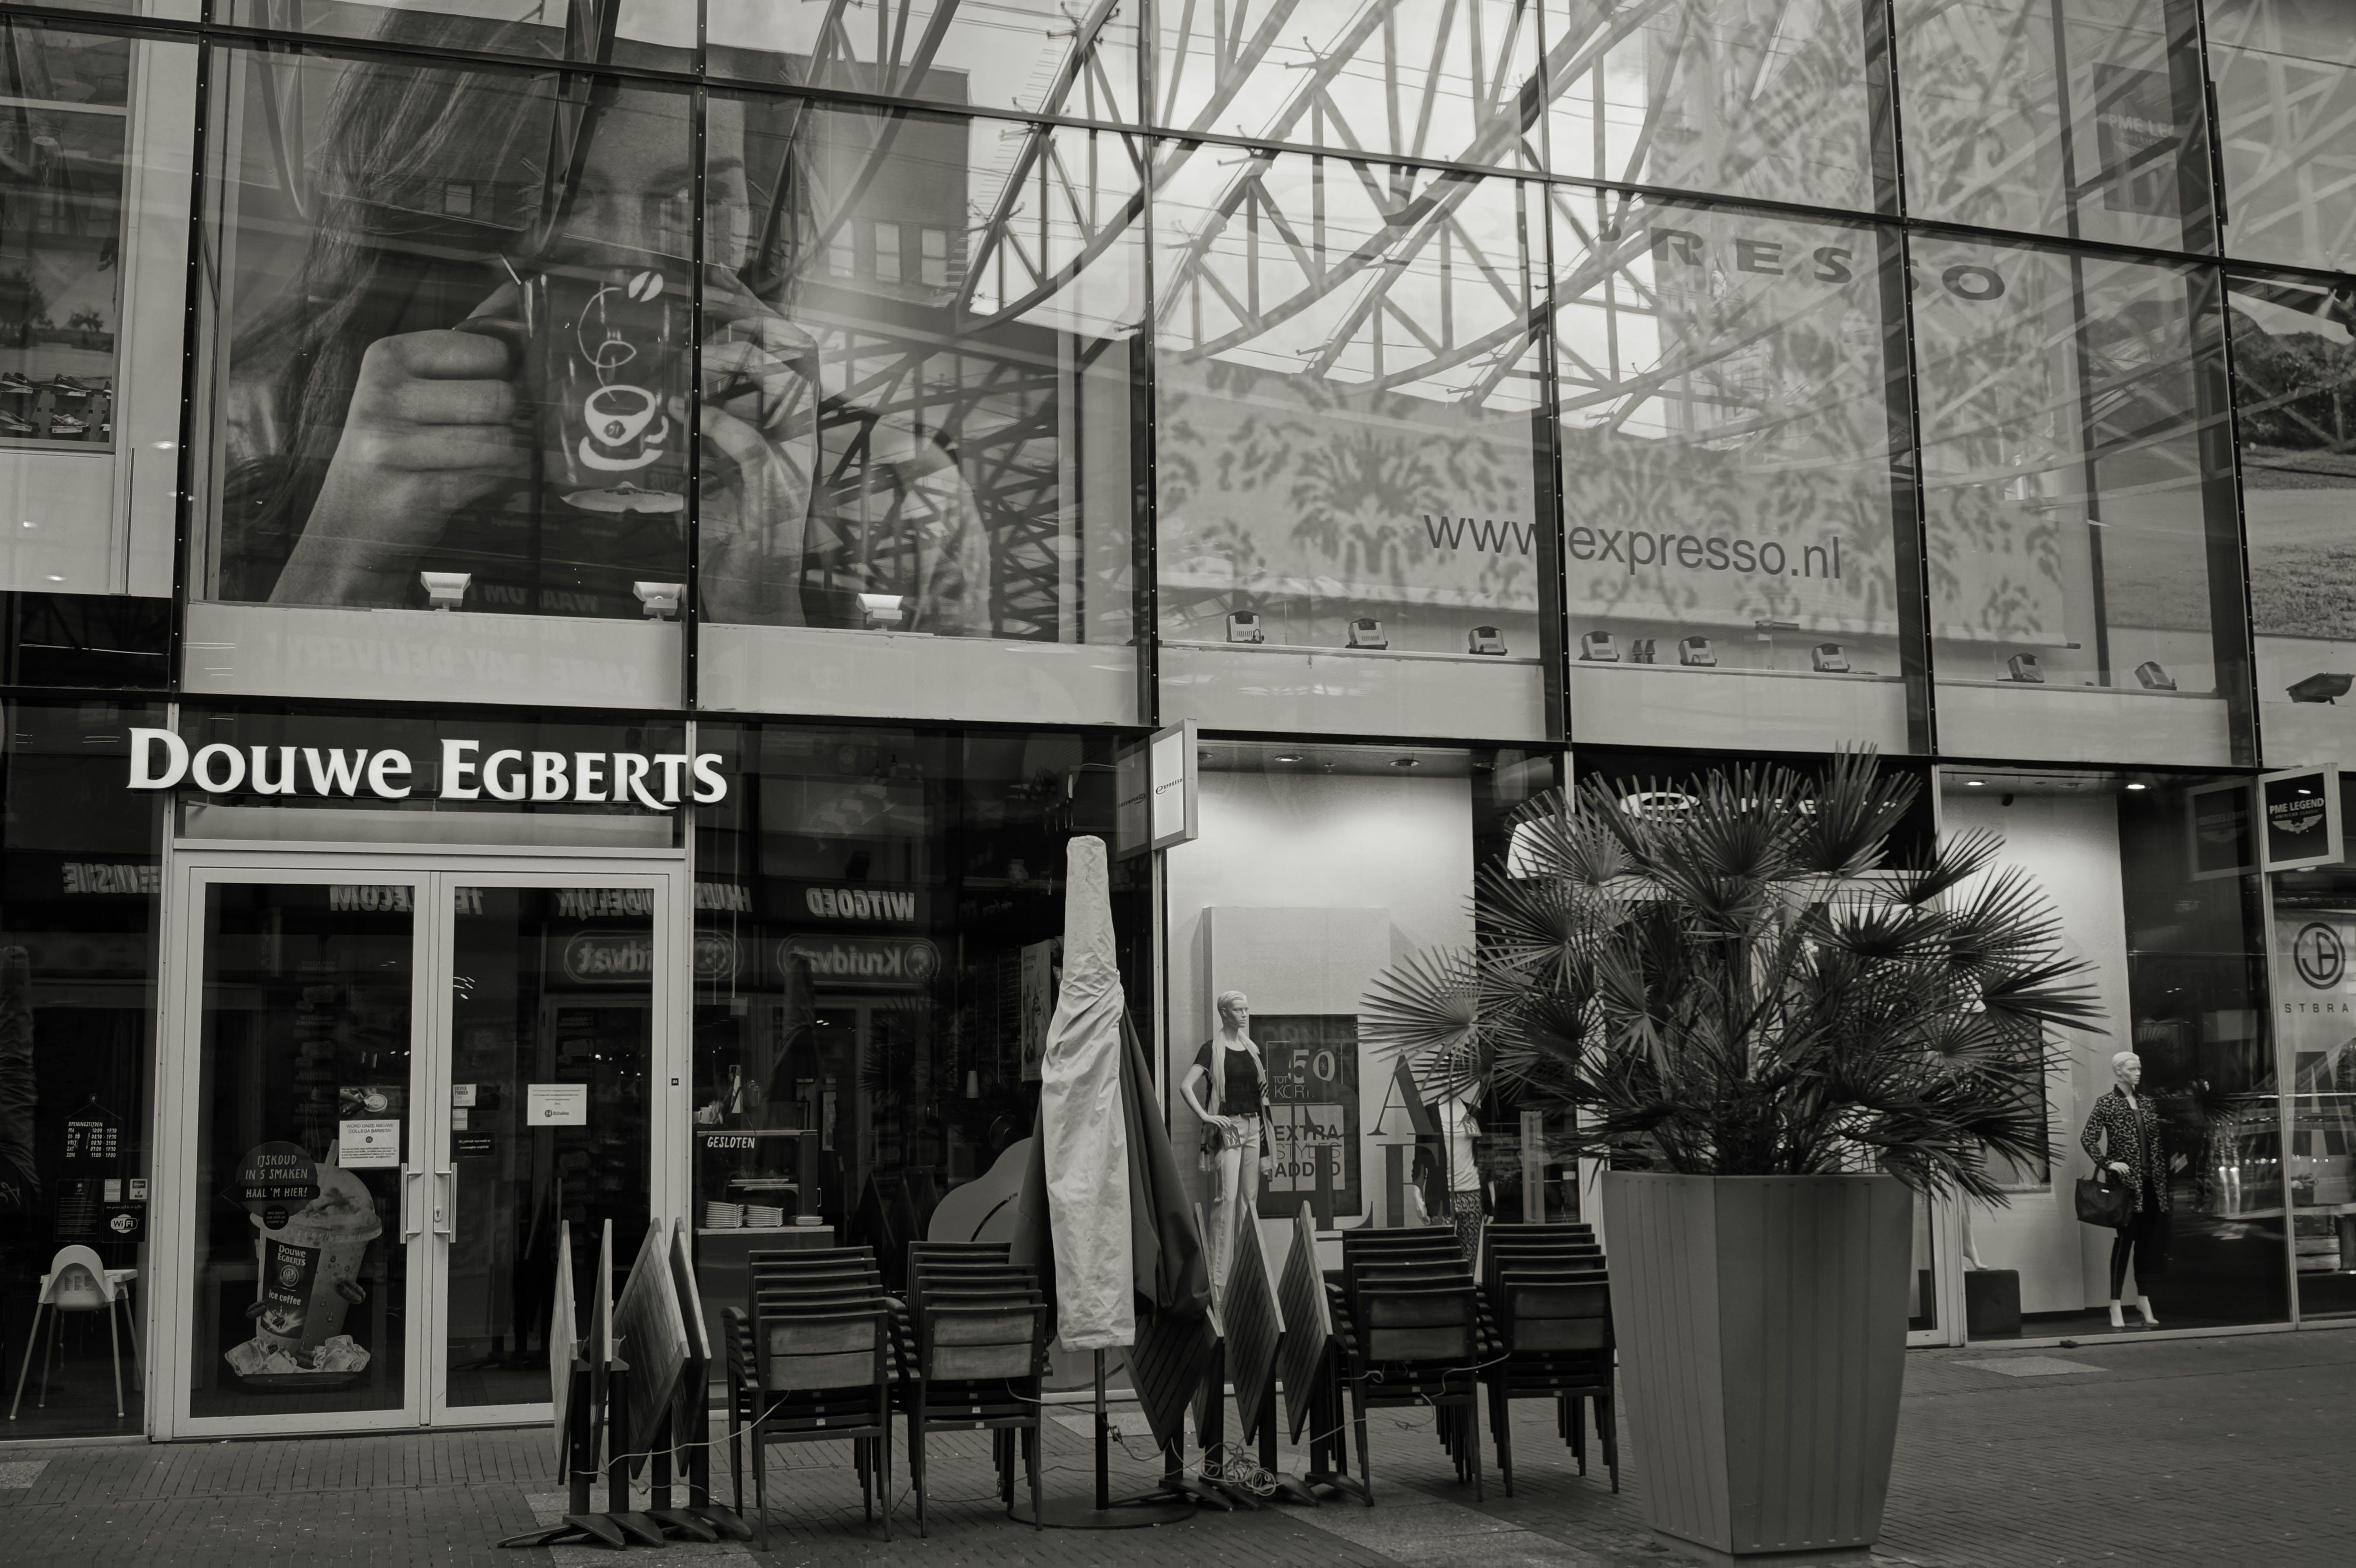 Grayscale Photography of Douwe Egbert's Restaurant